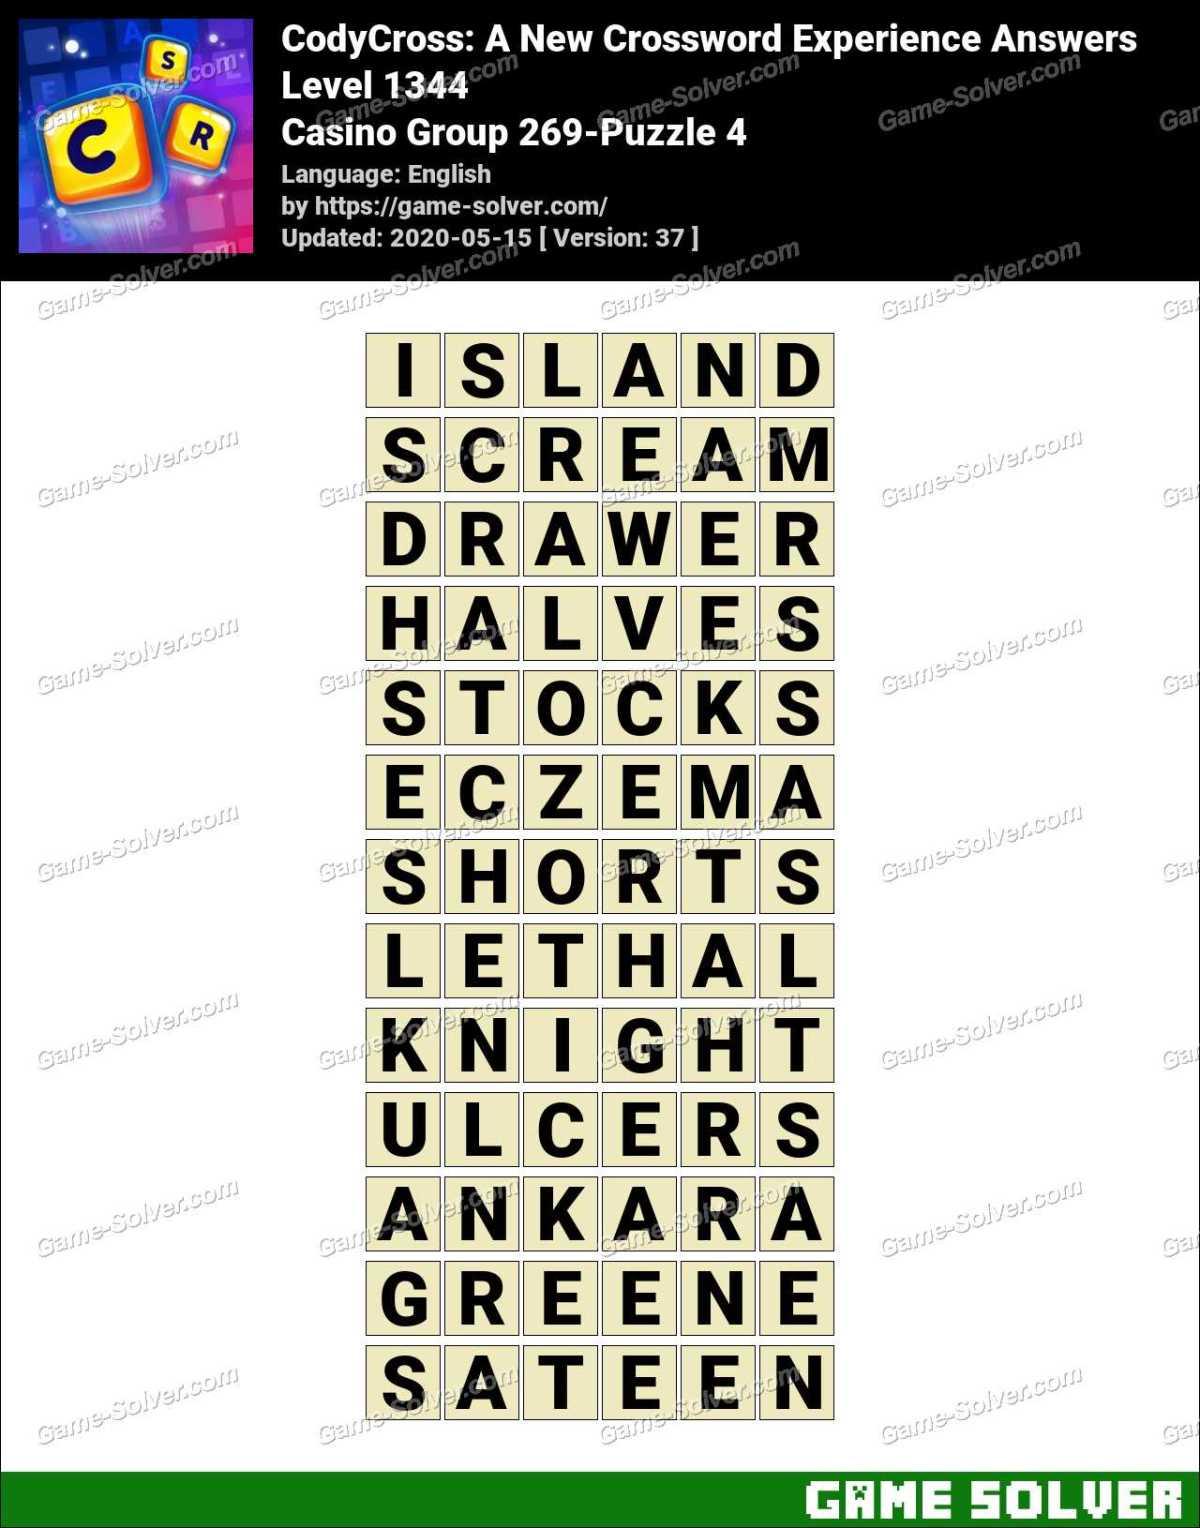 CodyCross Casino Group 269-Puzzle 4 Answers